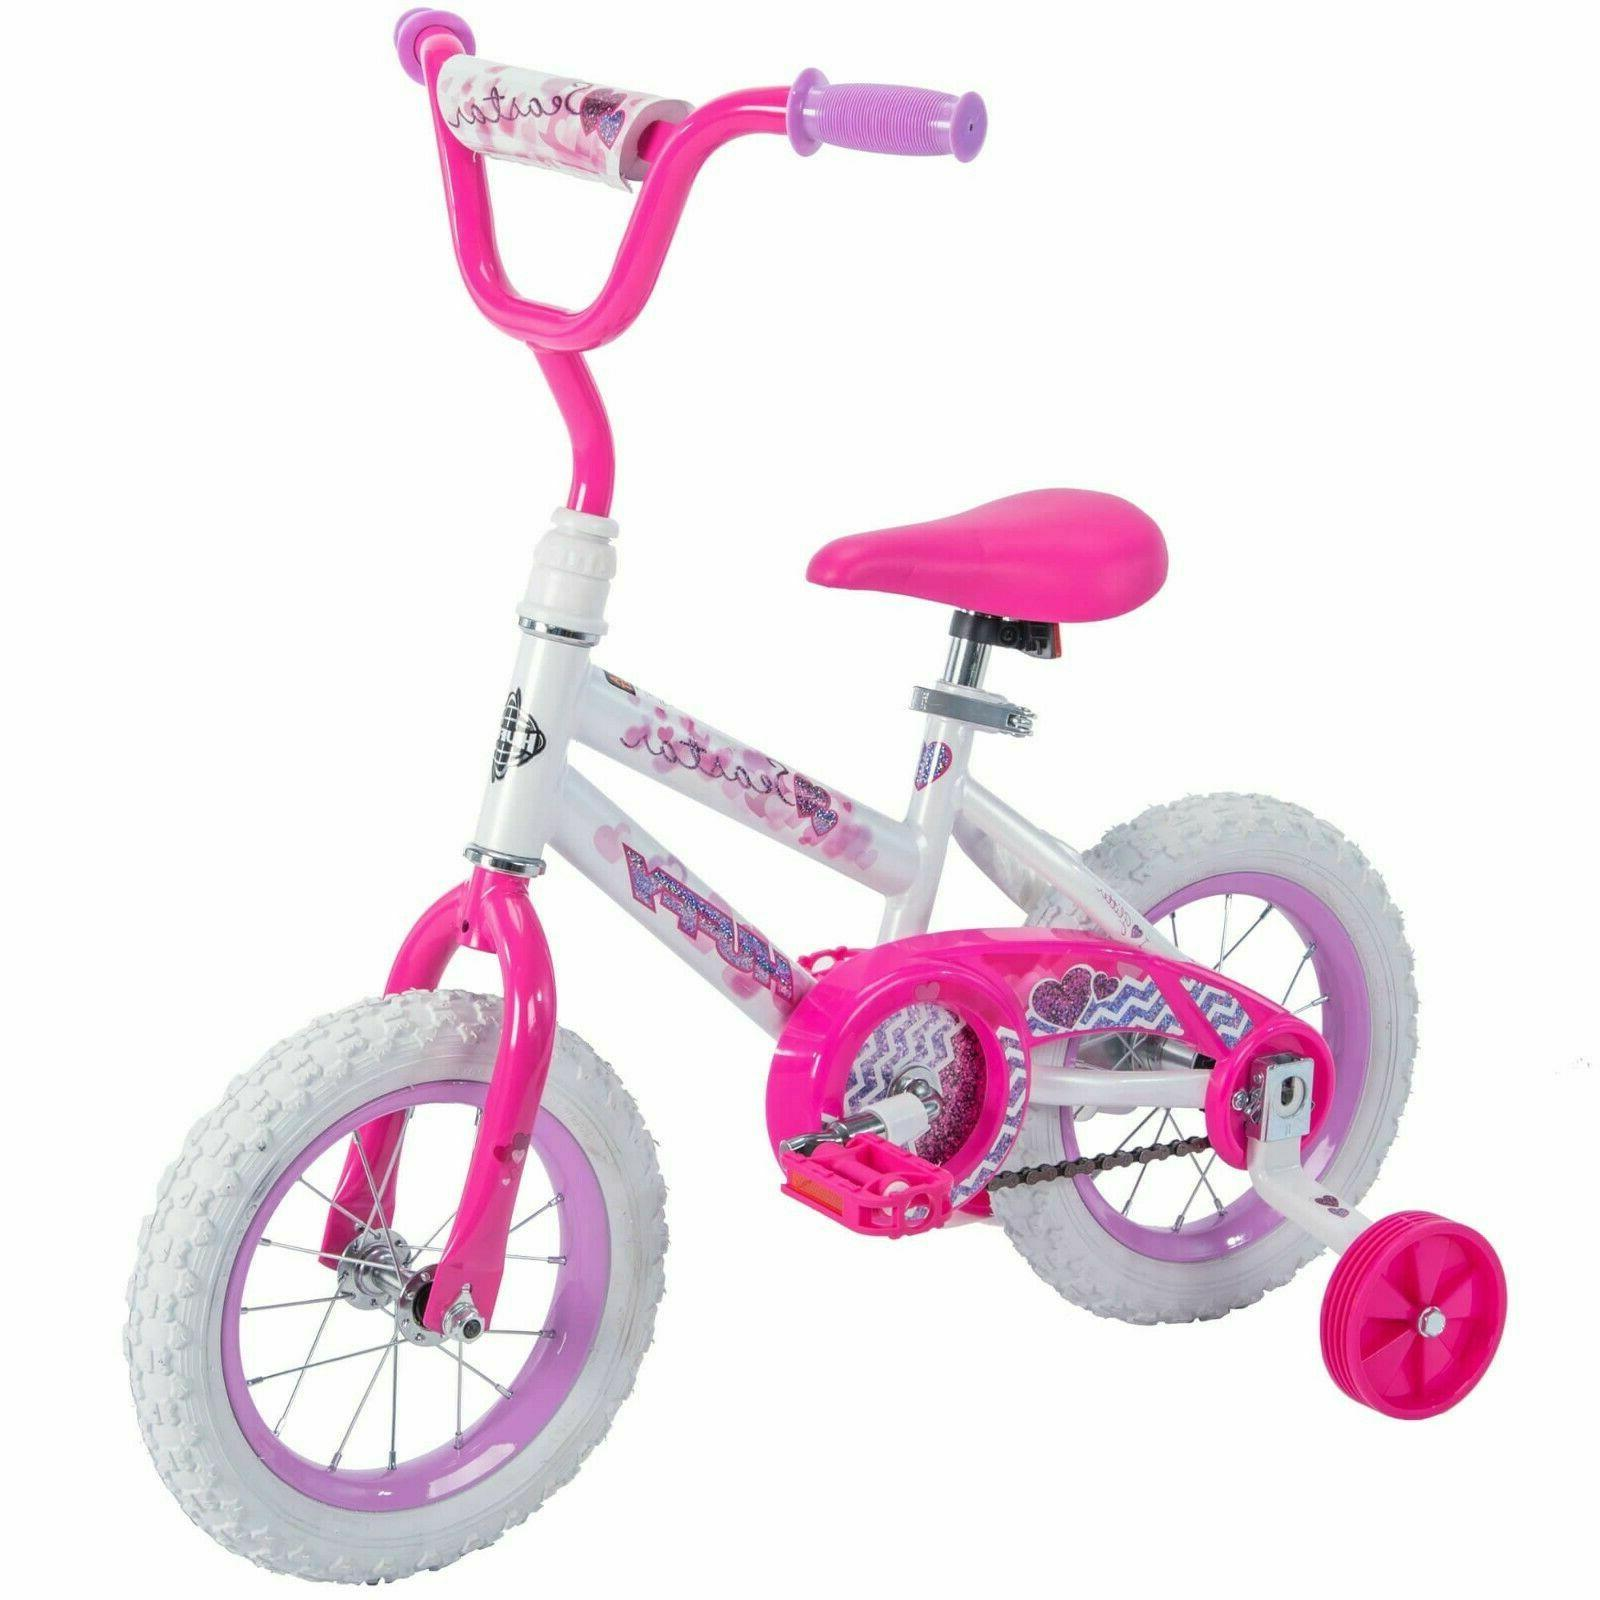 12 Inch Girl's Bike Kids Bicycle With Training Wheels Beginn